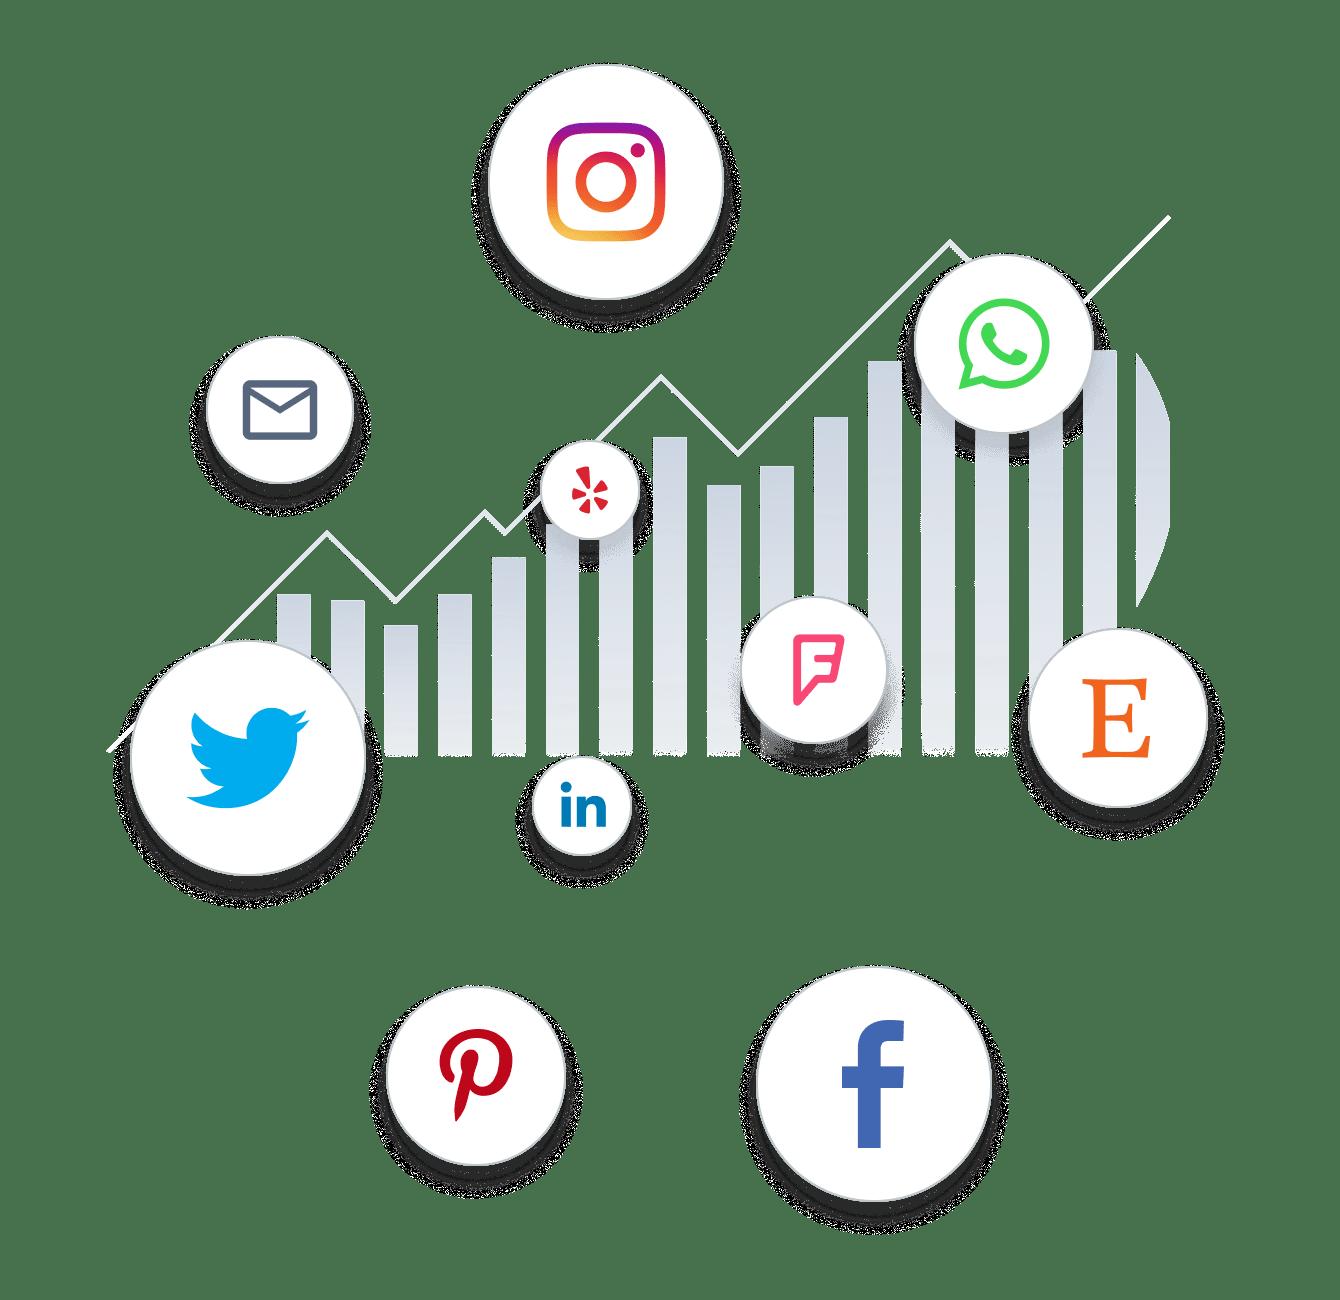 Img_alt_social_media_icons